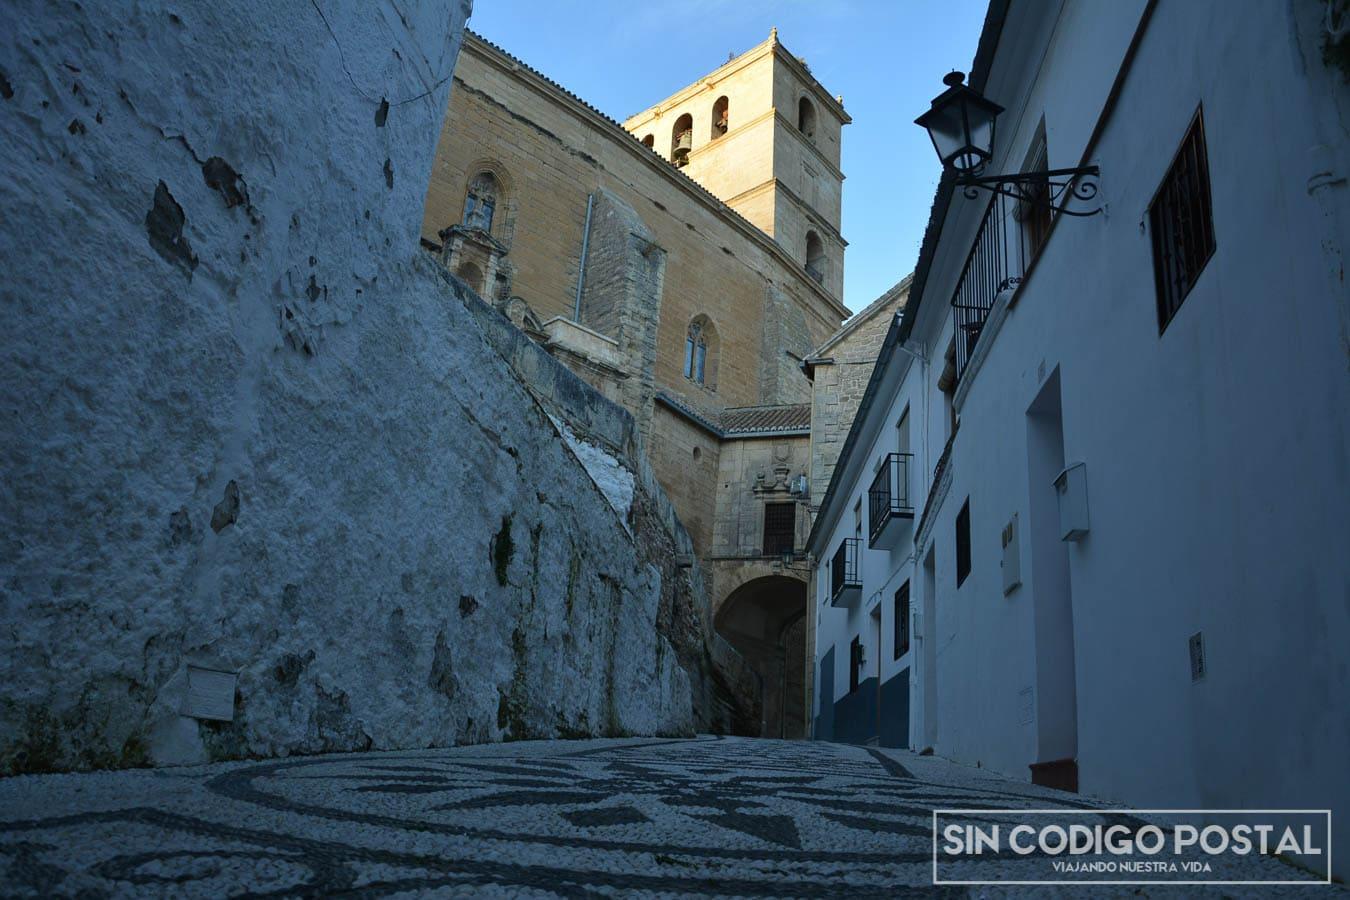 Calle adoquinada e iglesia de la encarnación de Alhama de Granada